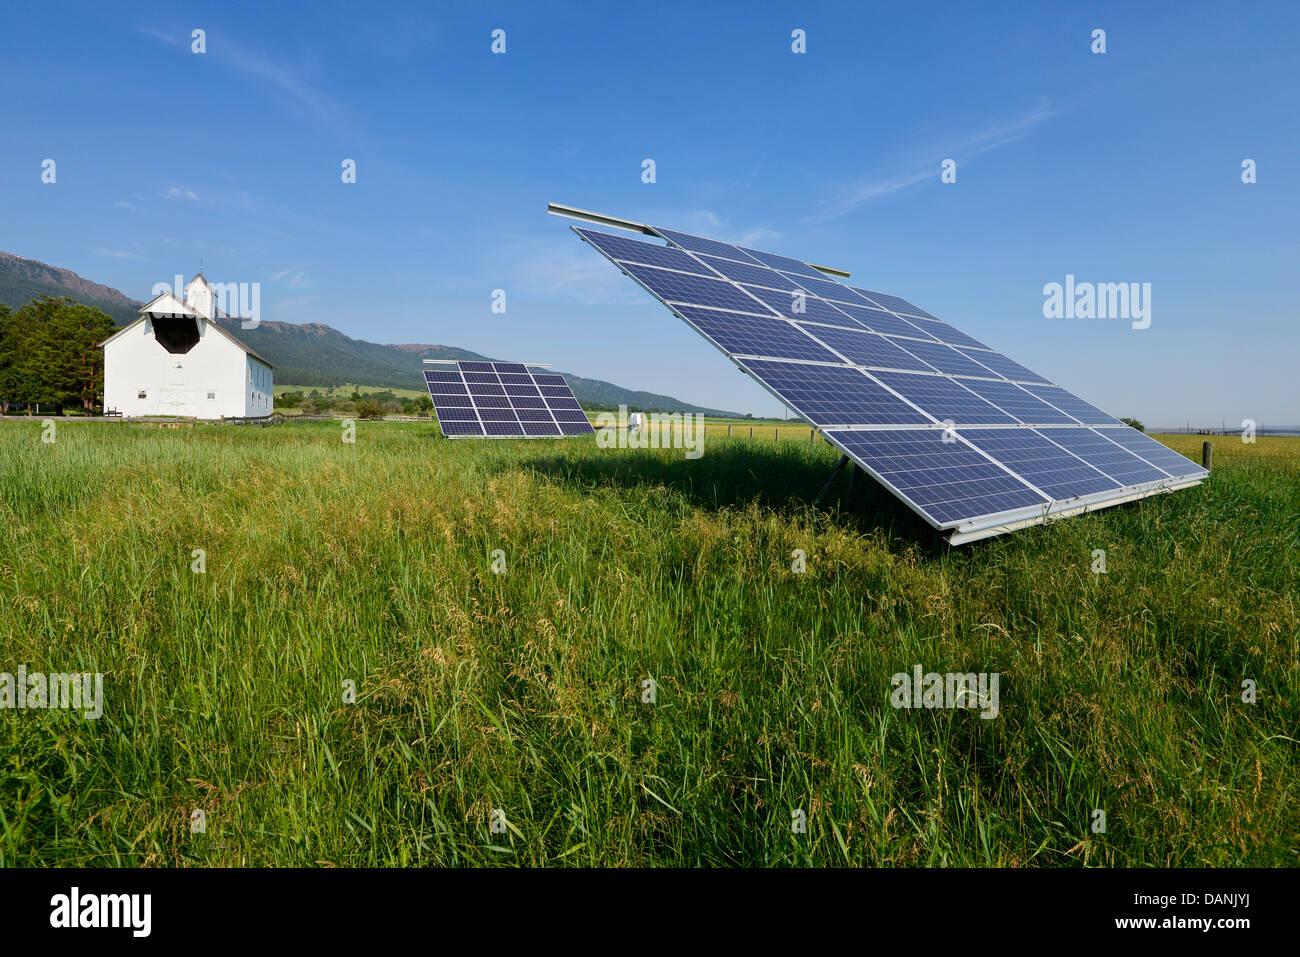 Solar panels on a farm in Oregon's Wallowa Valley. - Stock Image